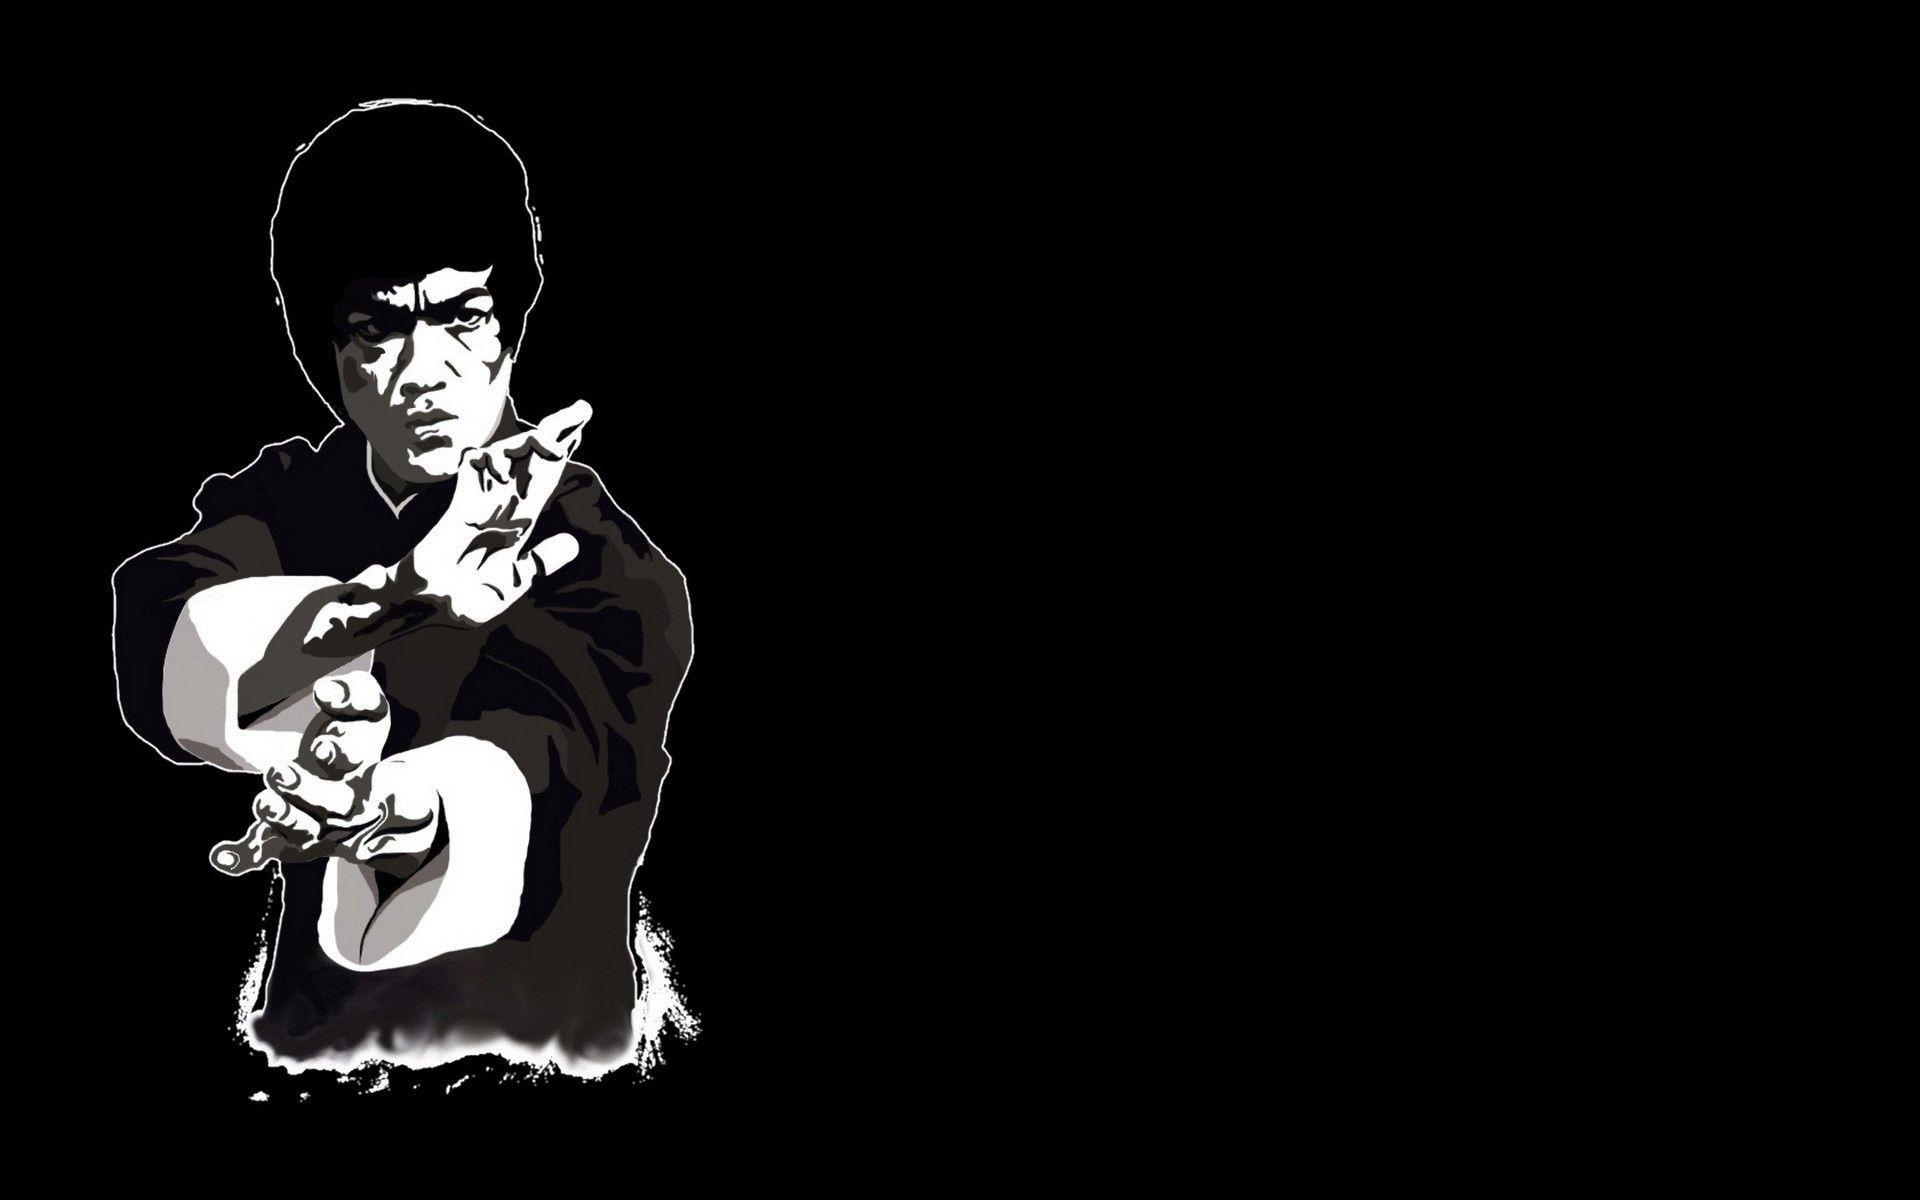 Elegant Bruce Lee Hd Wallpaper Iphone Bruce Lee Bruce Lee Pictures Iphone Wallpaper